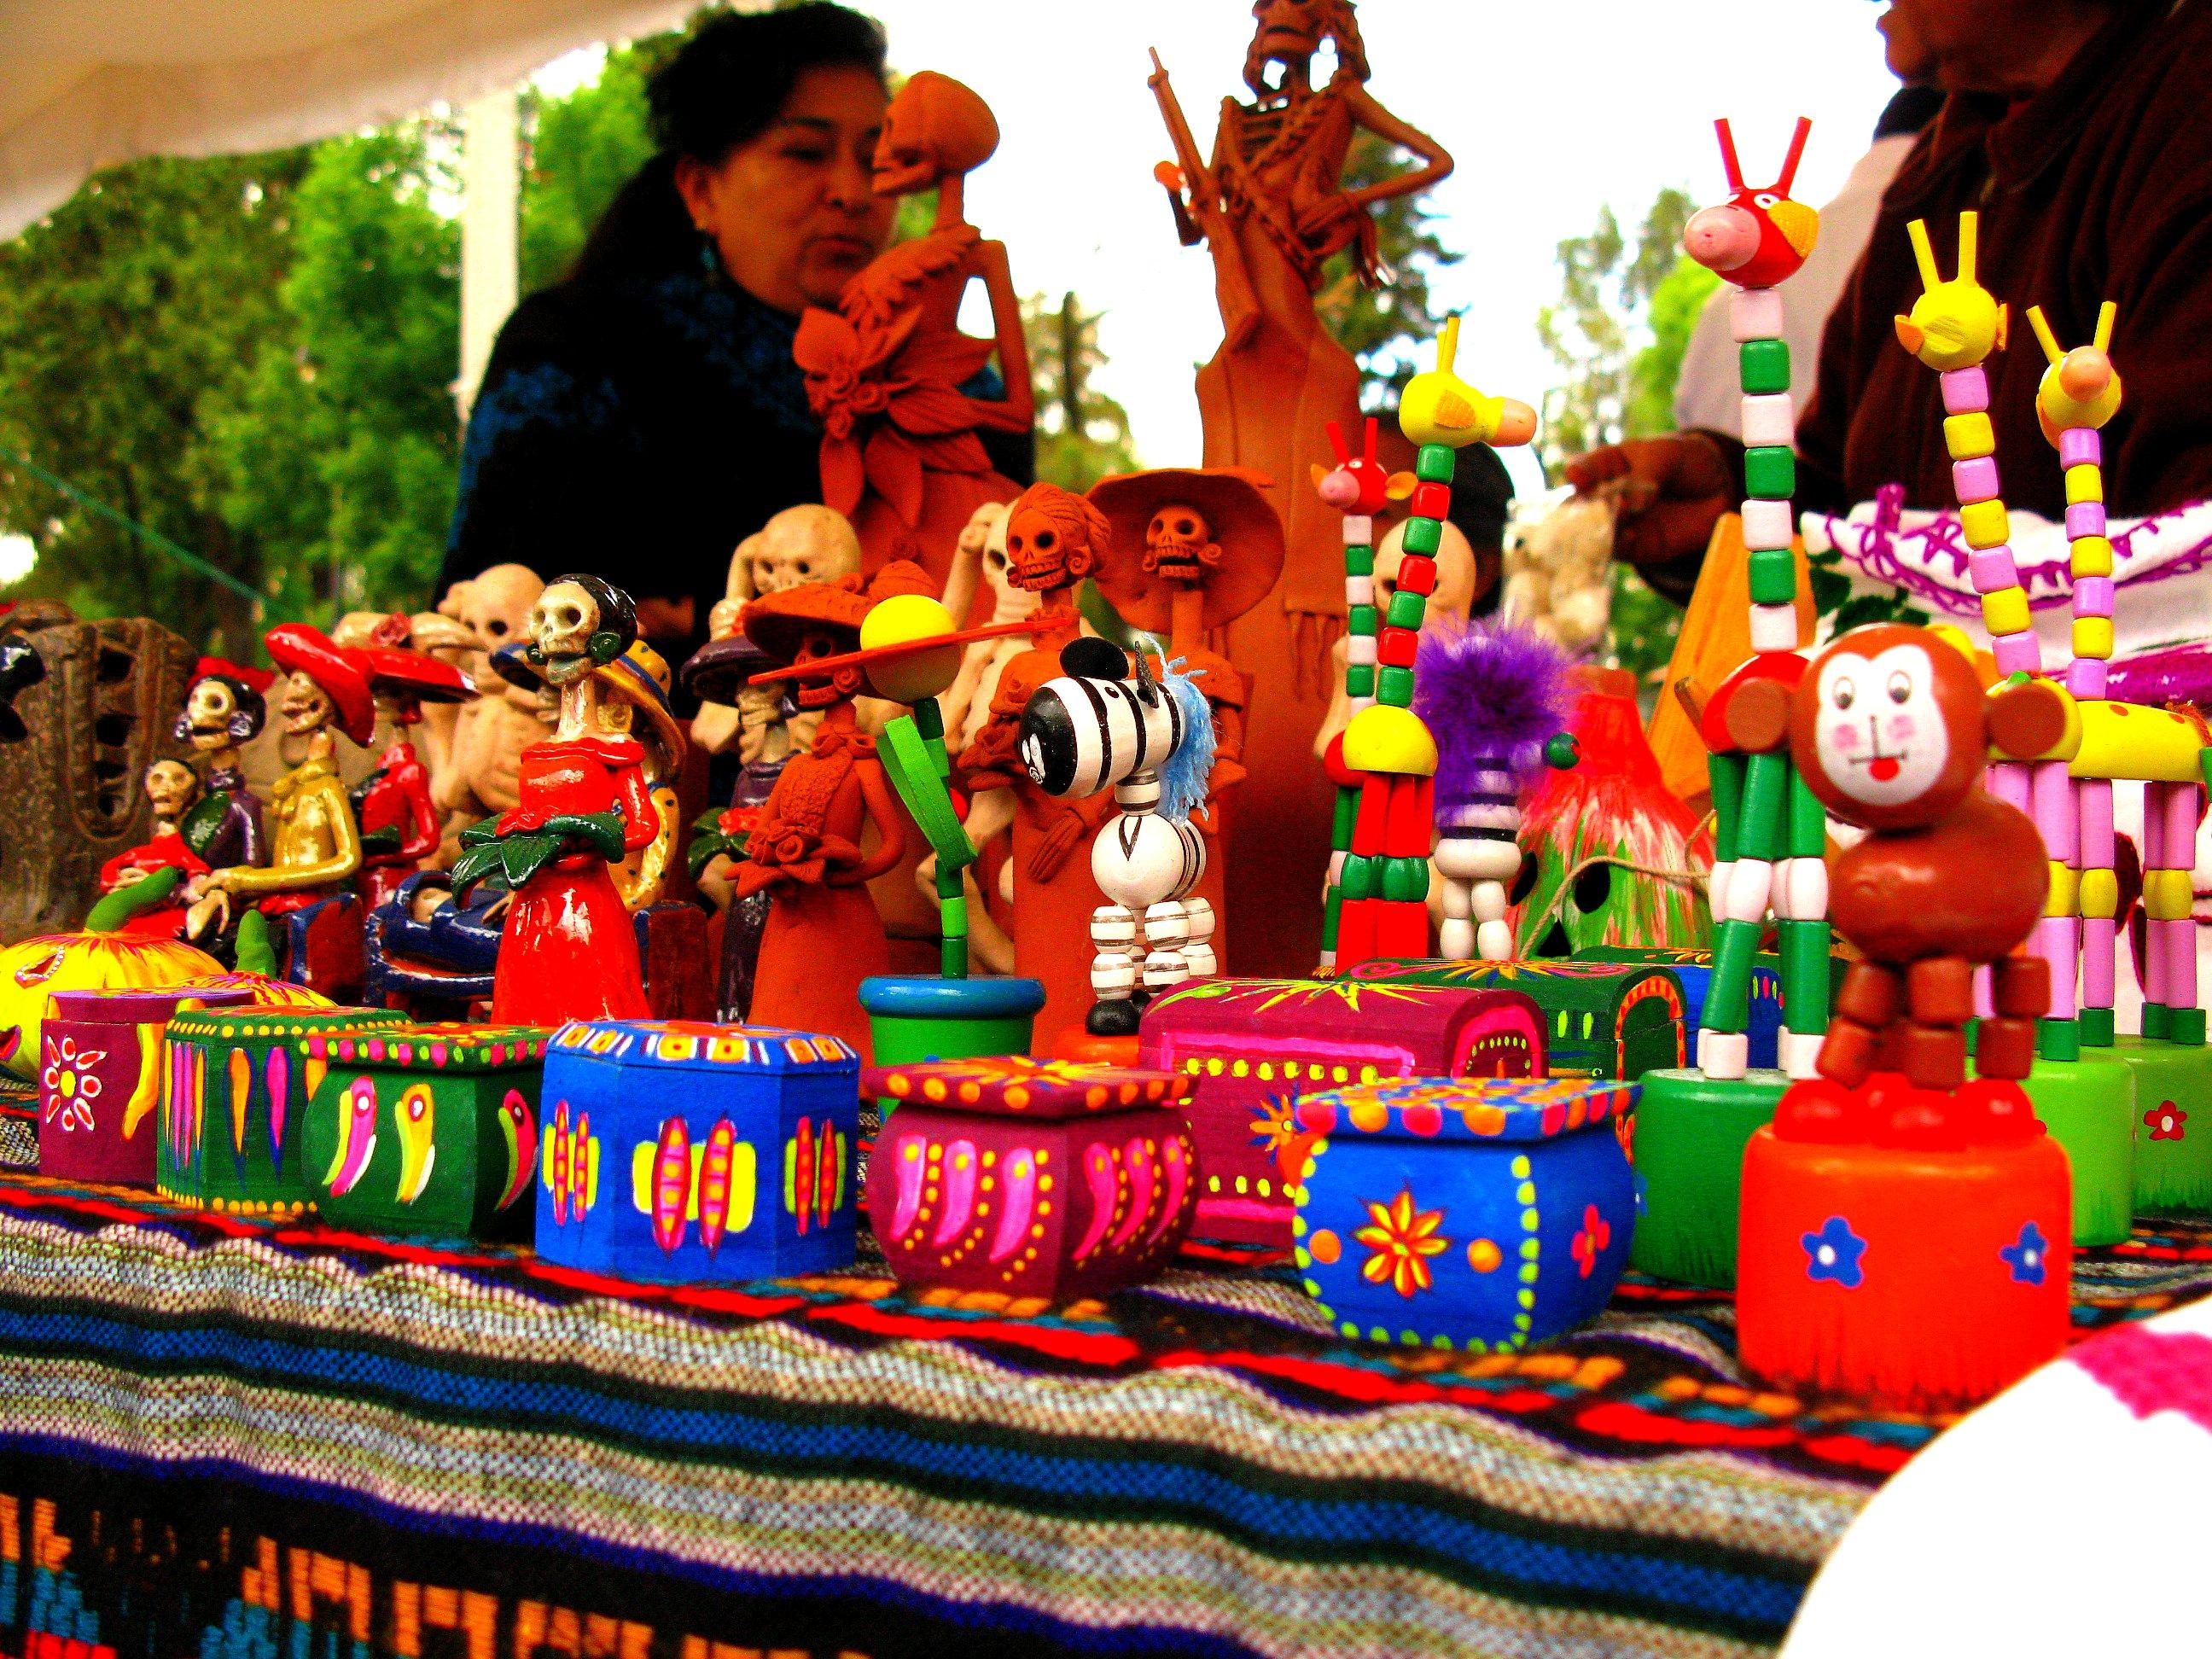 Meksykańska artystka w Mexico City (fot. Raul Alvarez / Flickr.com / CC BY-NC-ND 2.0)